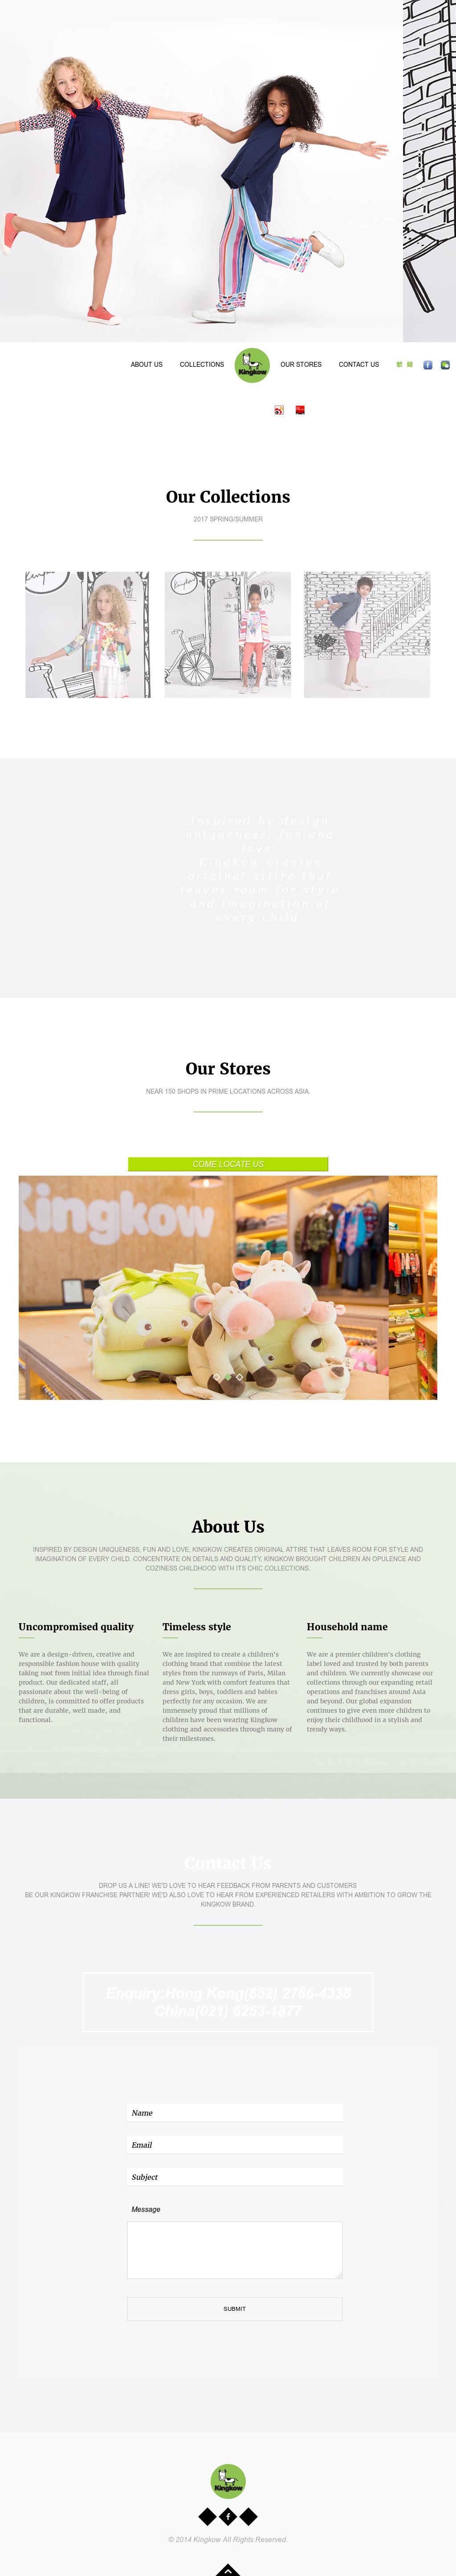 Kingkow online dating